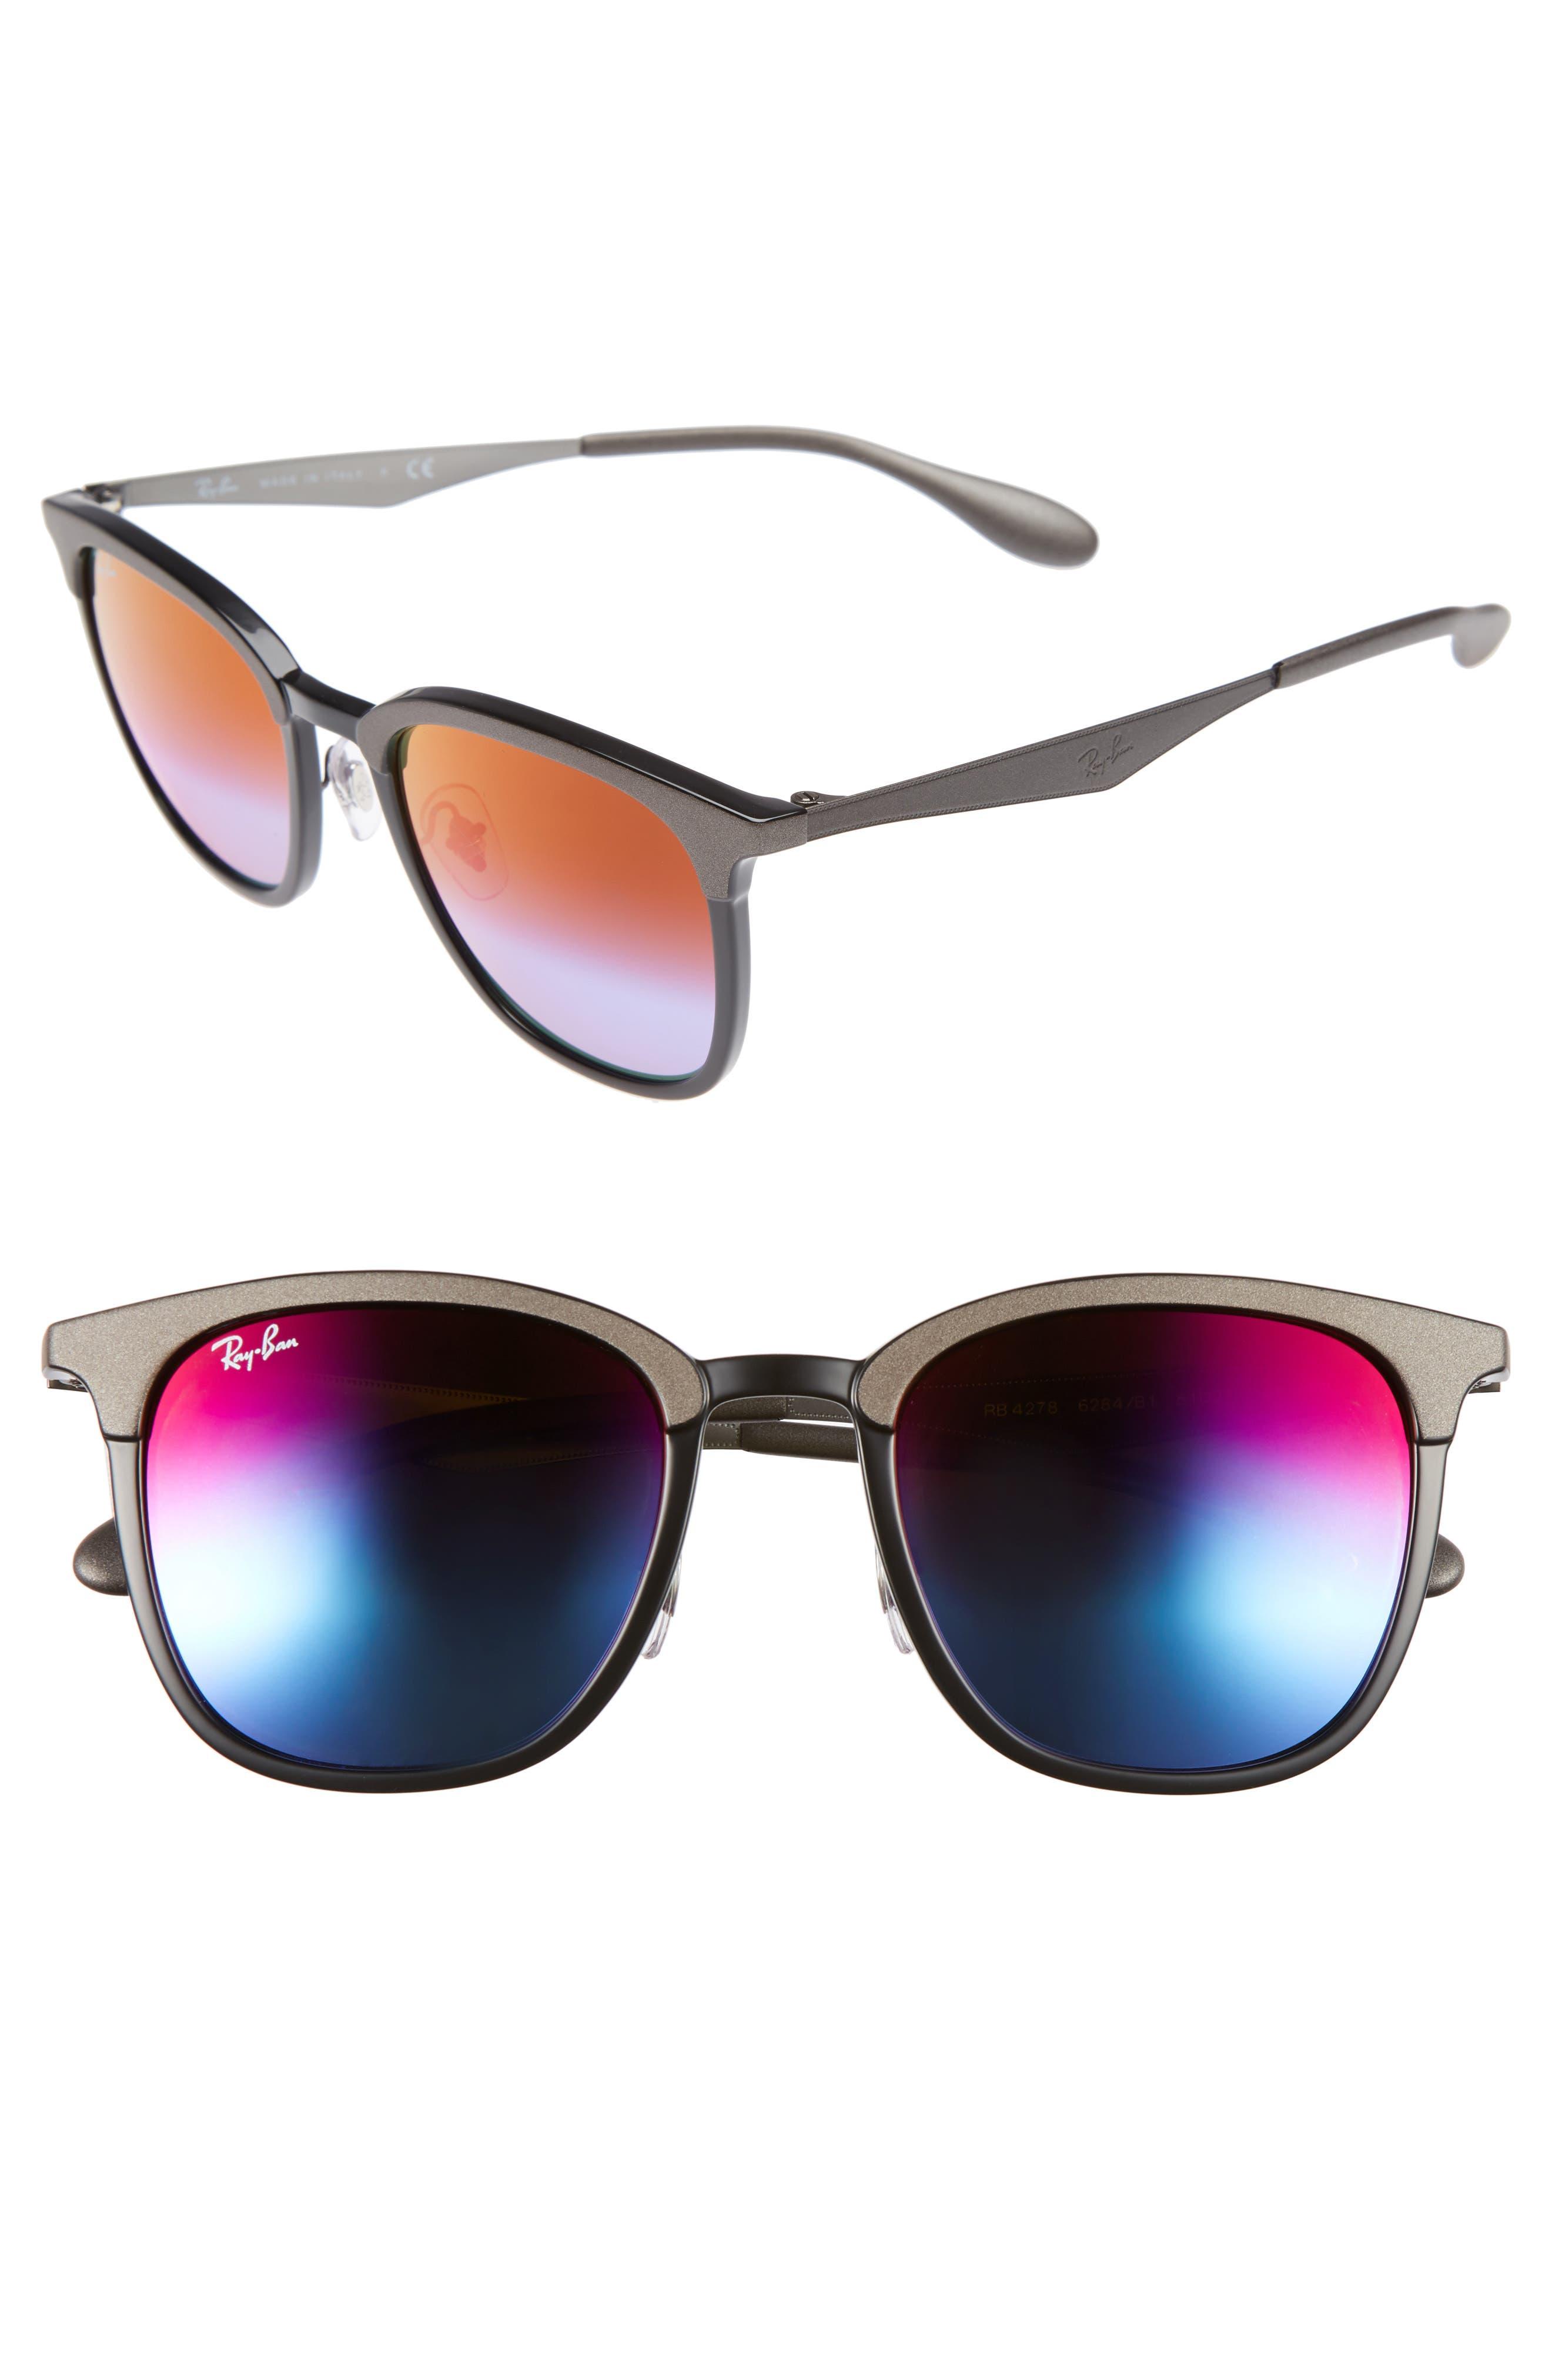 Ray-Ban 51mm Sunglasses